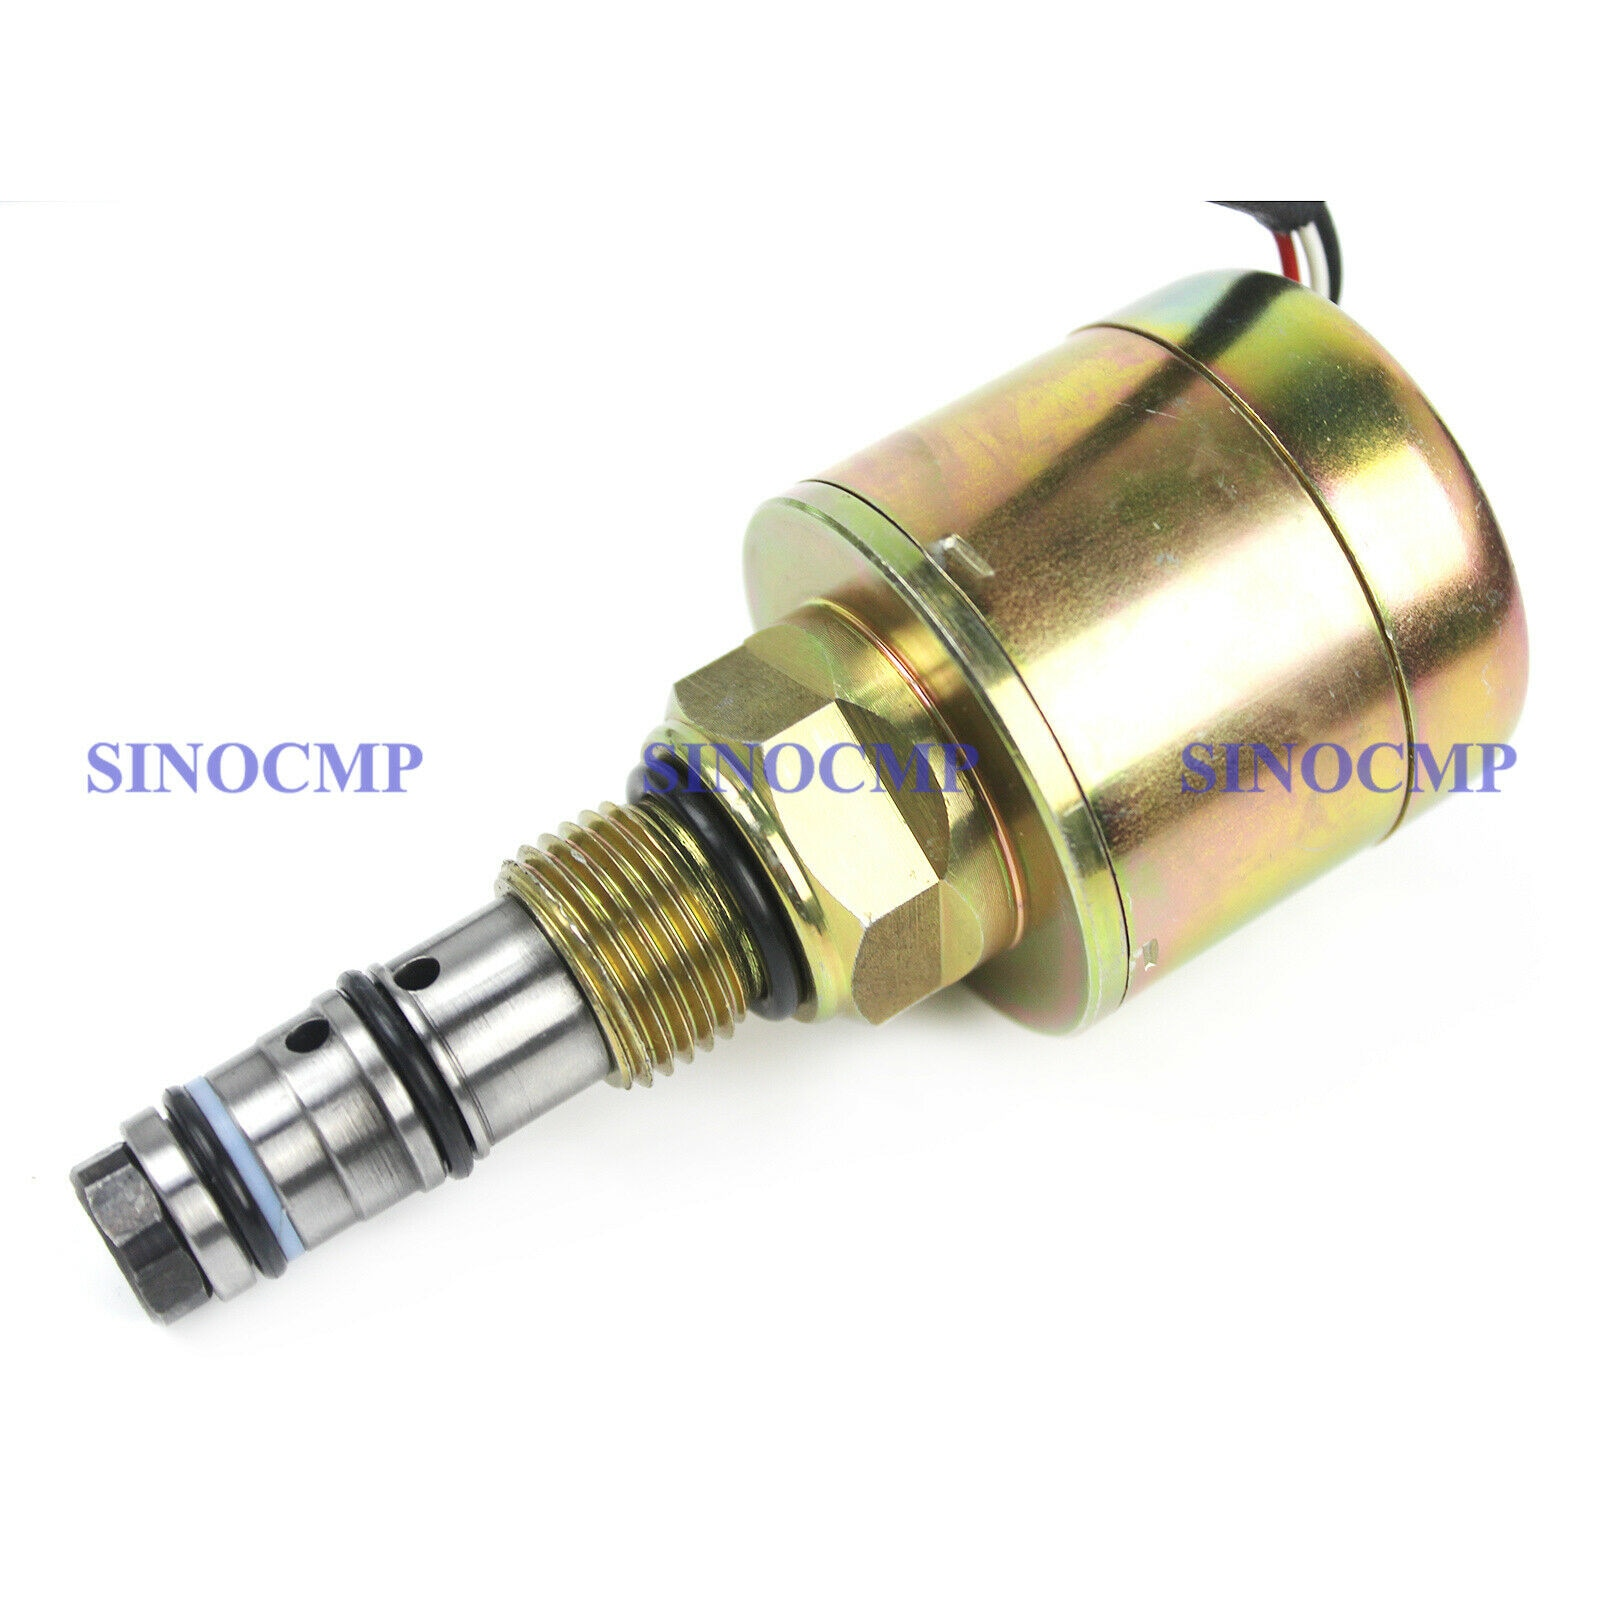 SINOCMP EX200-1/2/3/5 التفاضلية استشعار الضغط 4339559 9101532 لشركة هيتاشي